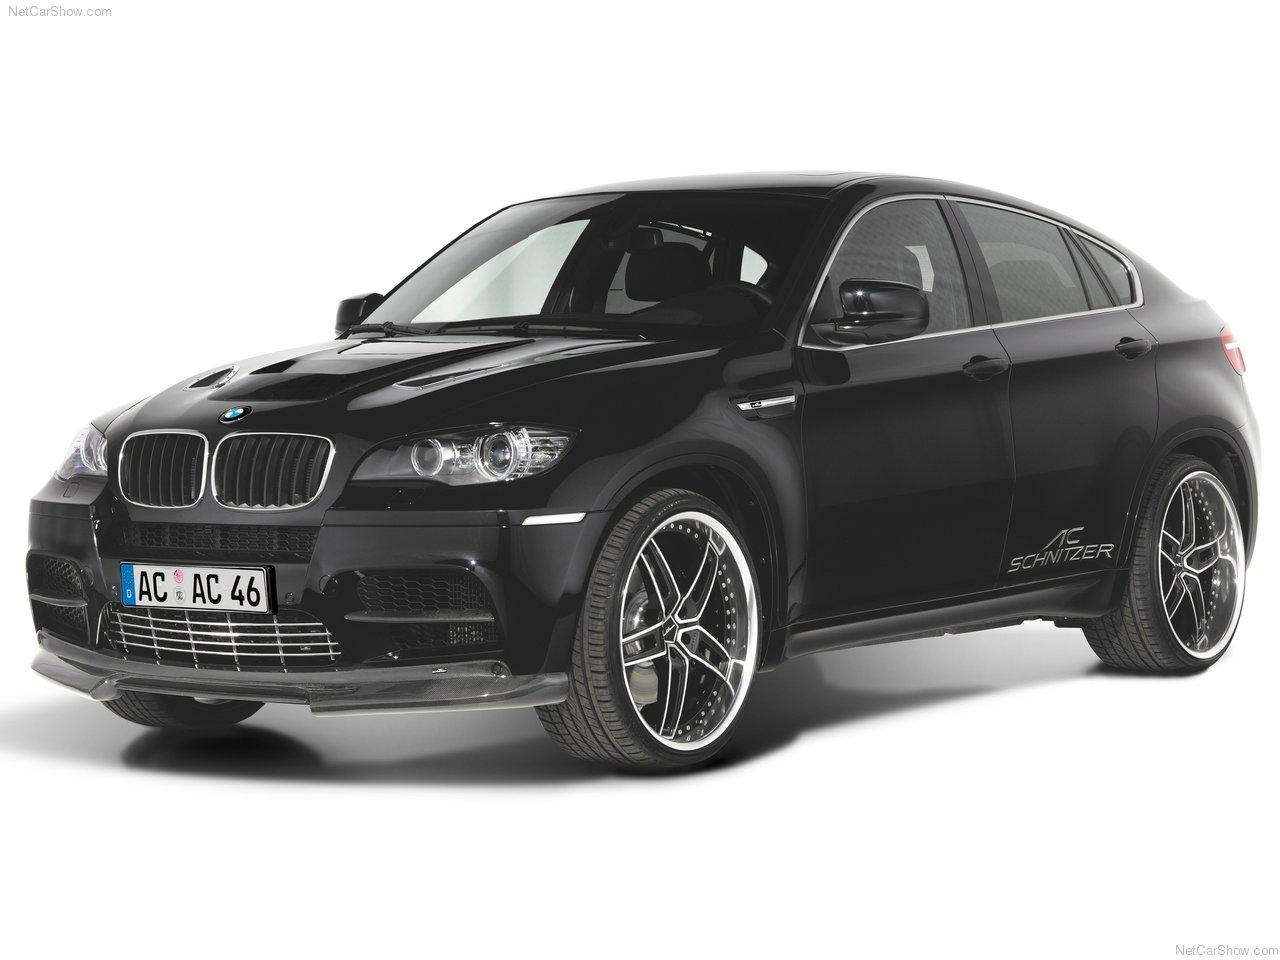 http://4.bp.blogspot.com/_eNKt9scw9RE/S_T5VxLuTUI/AAAAAAAAABo/-iOH-scIShY/s1600/AC_Schnitzer-BMW_X6_M_2010-new-car.jpg